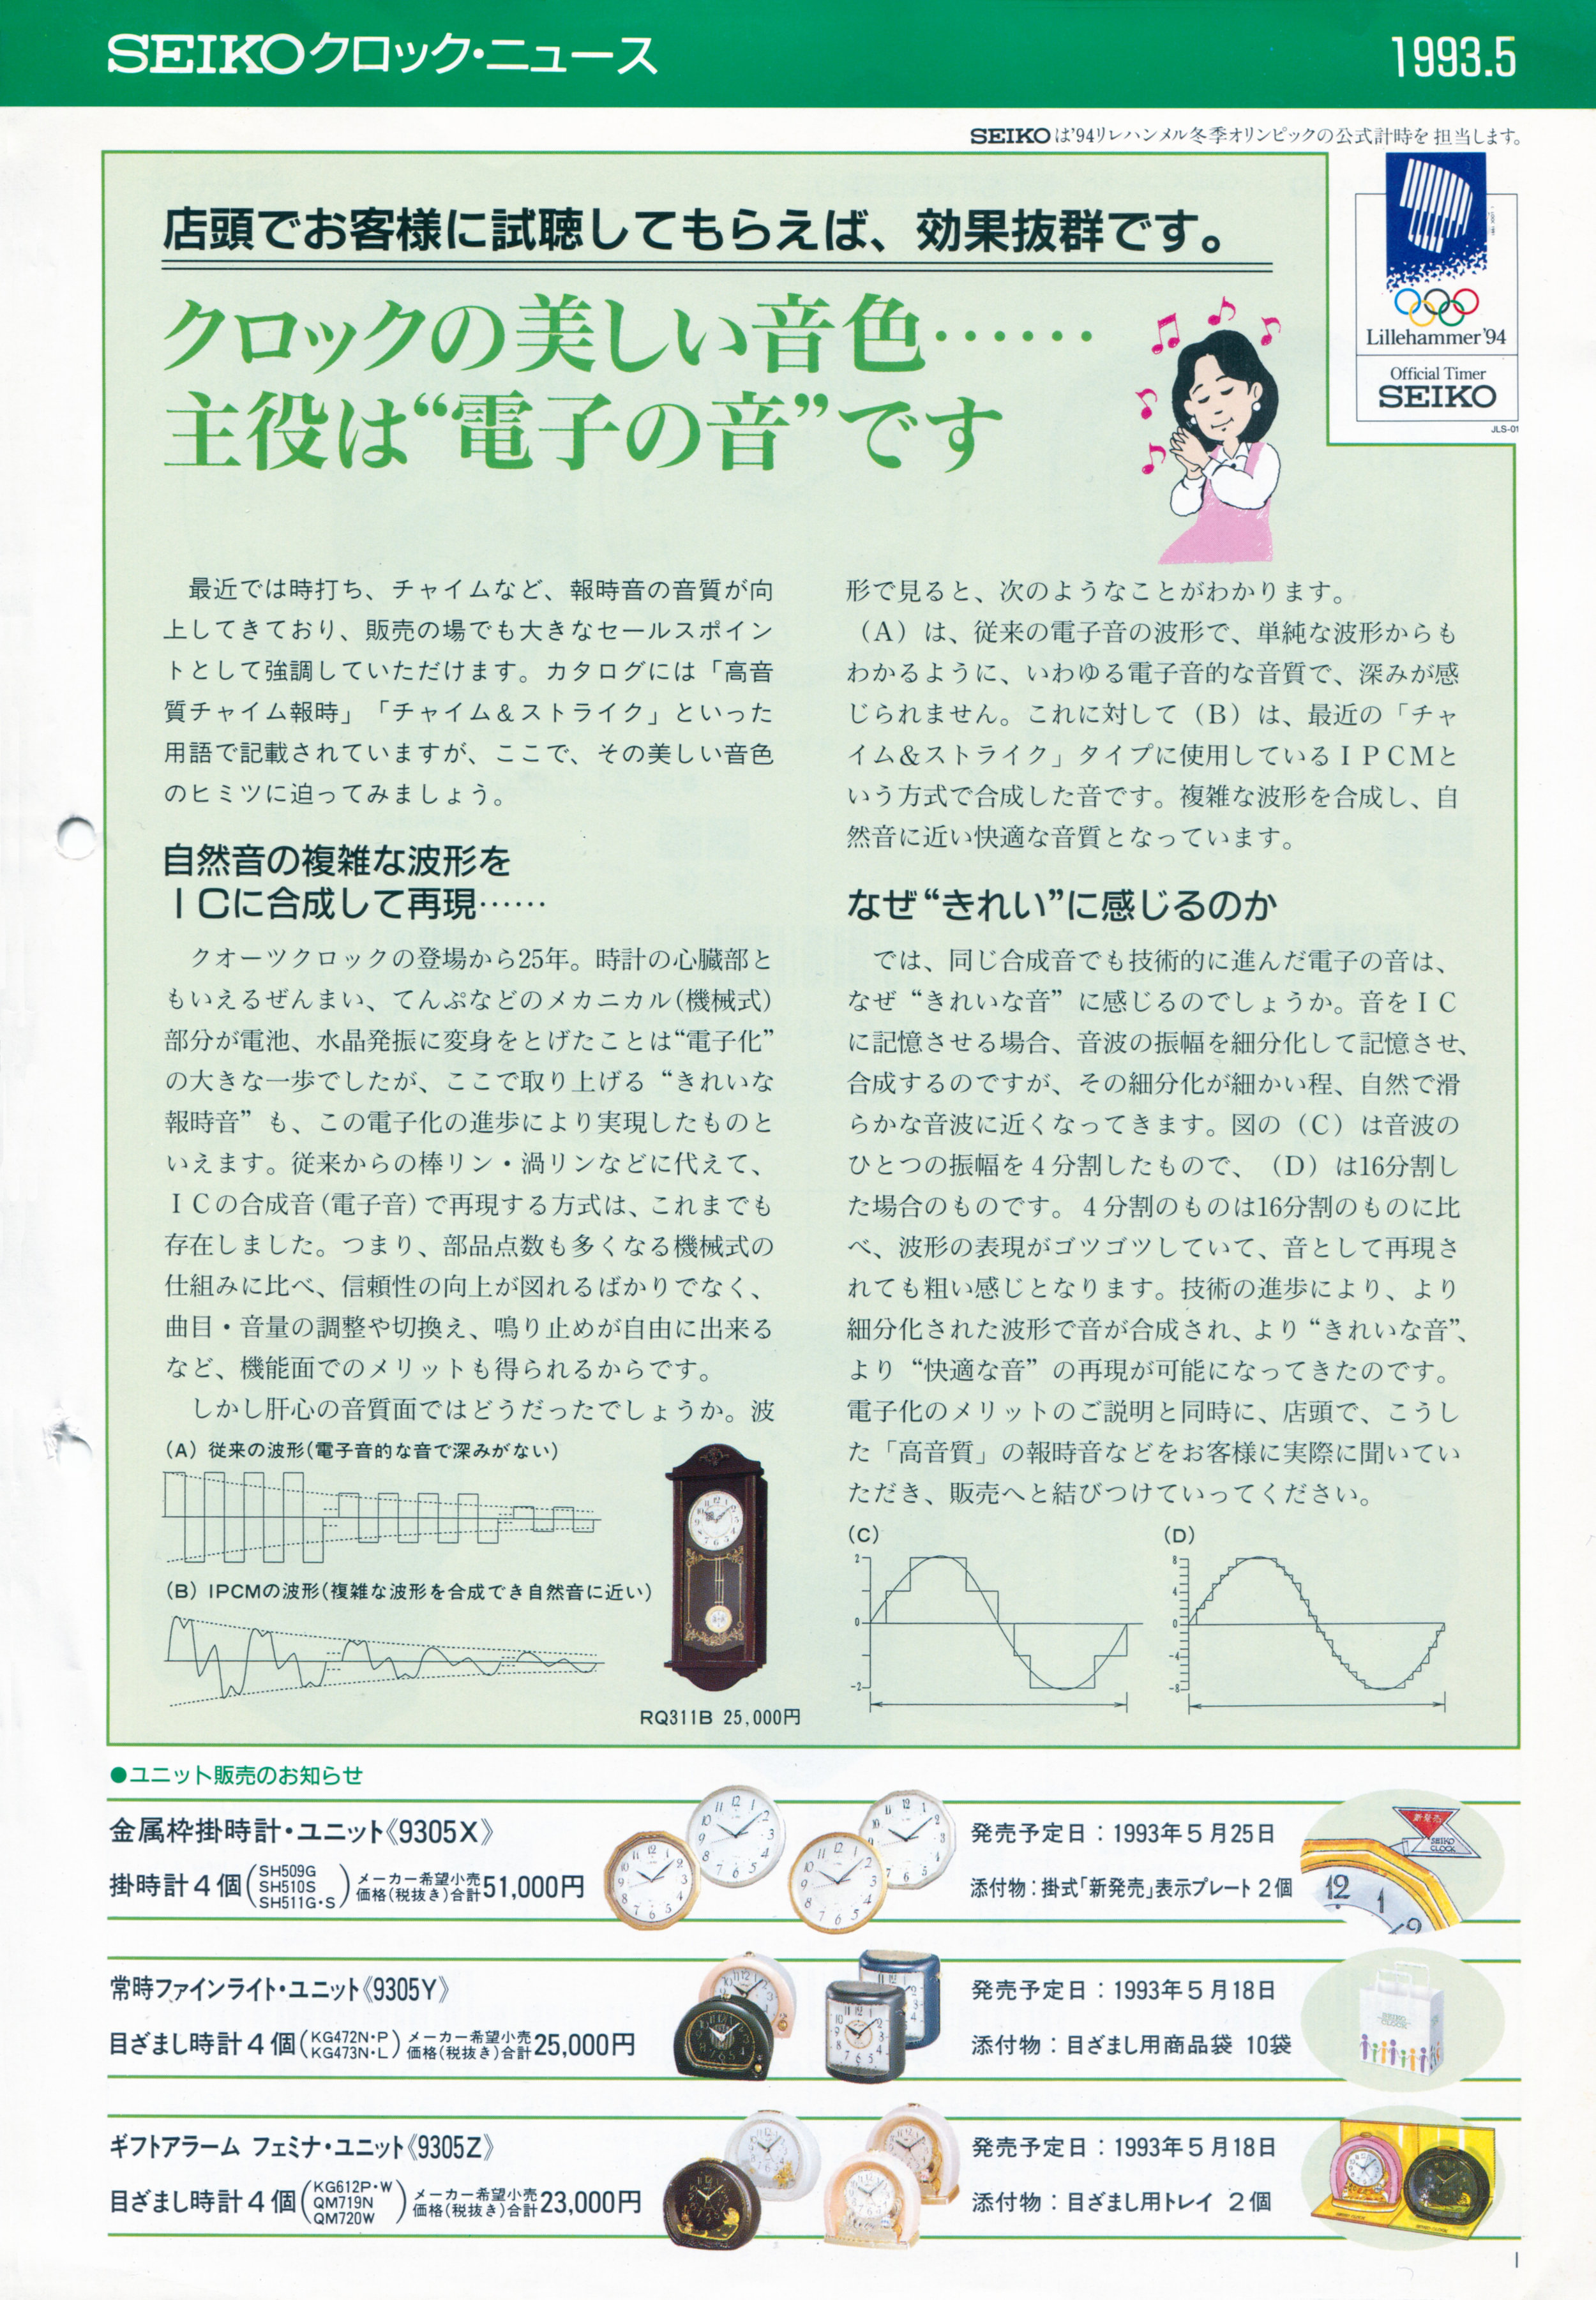 Seiko News 1993-5